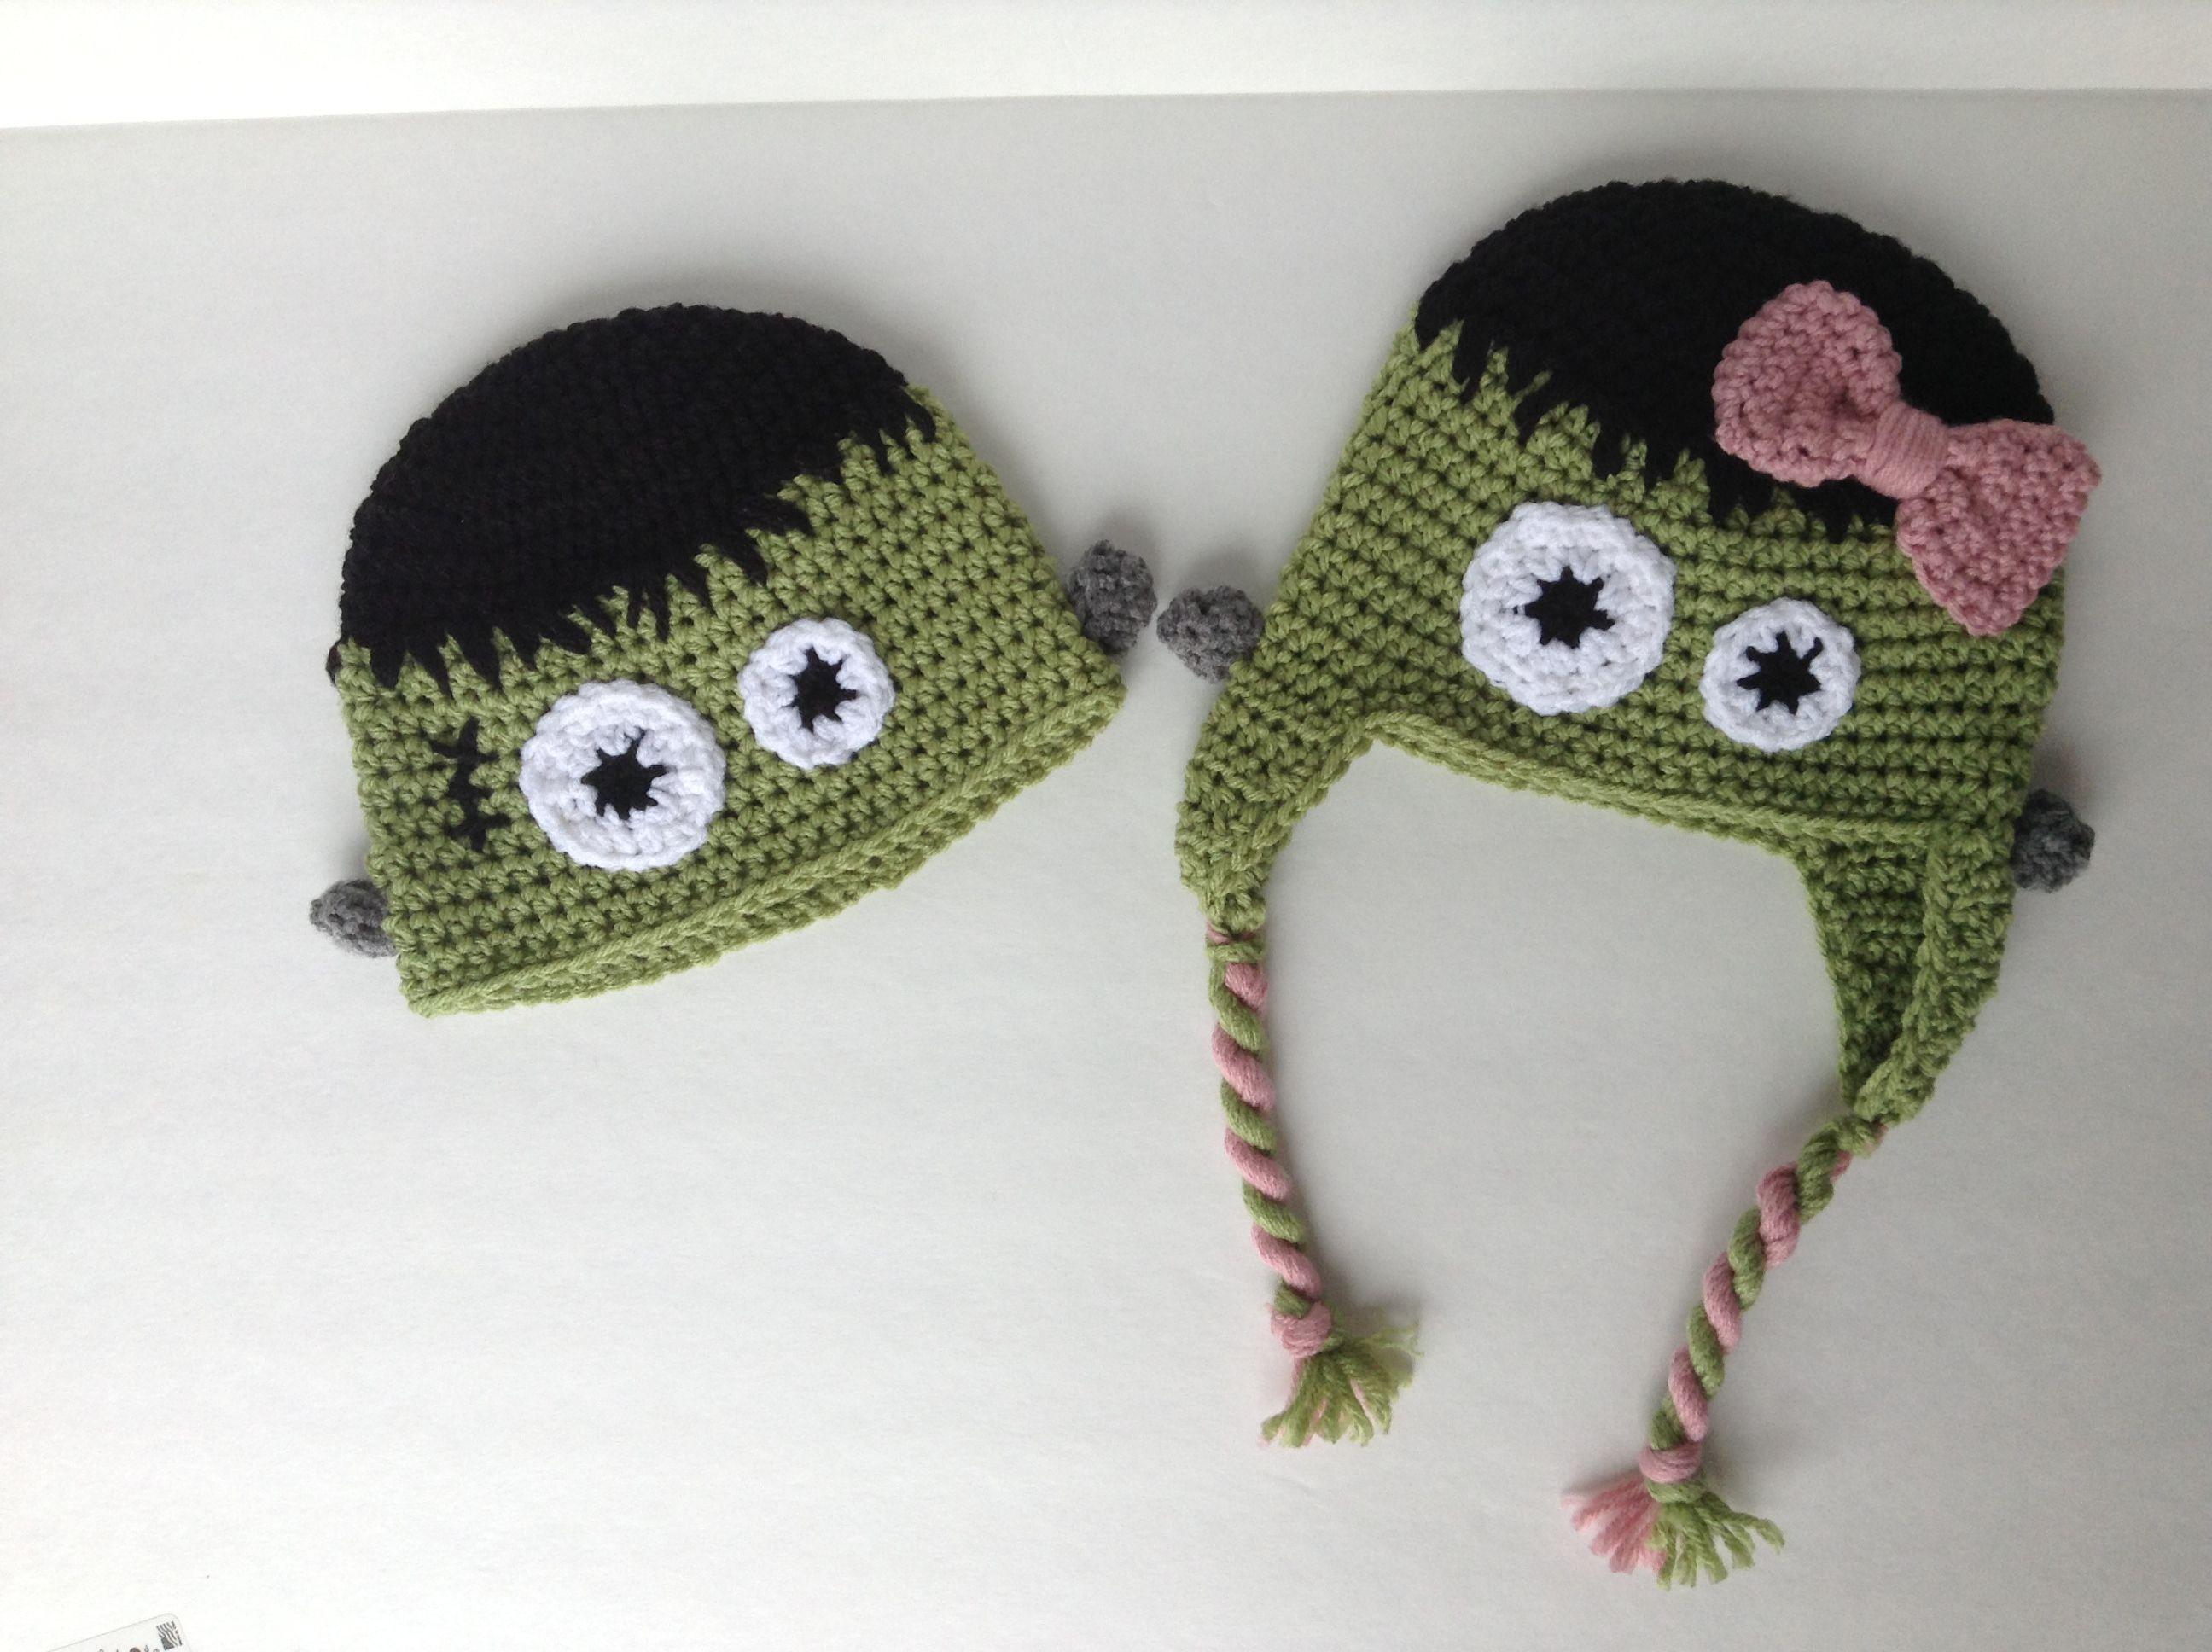 Crochet Character hat Craze! | Crochet character hats, Free crochet ...